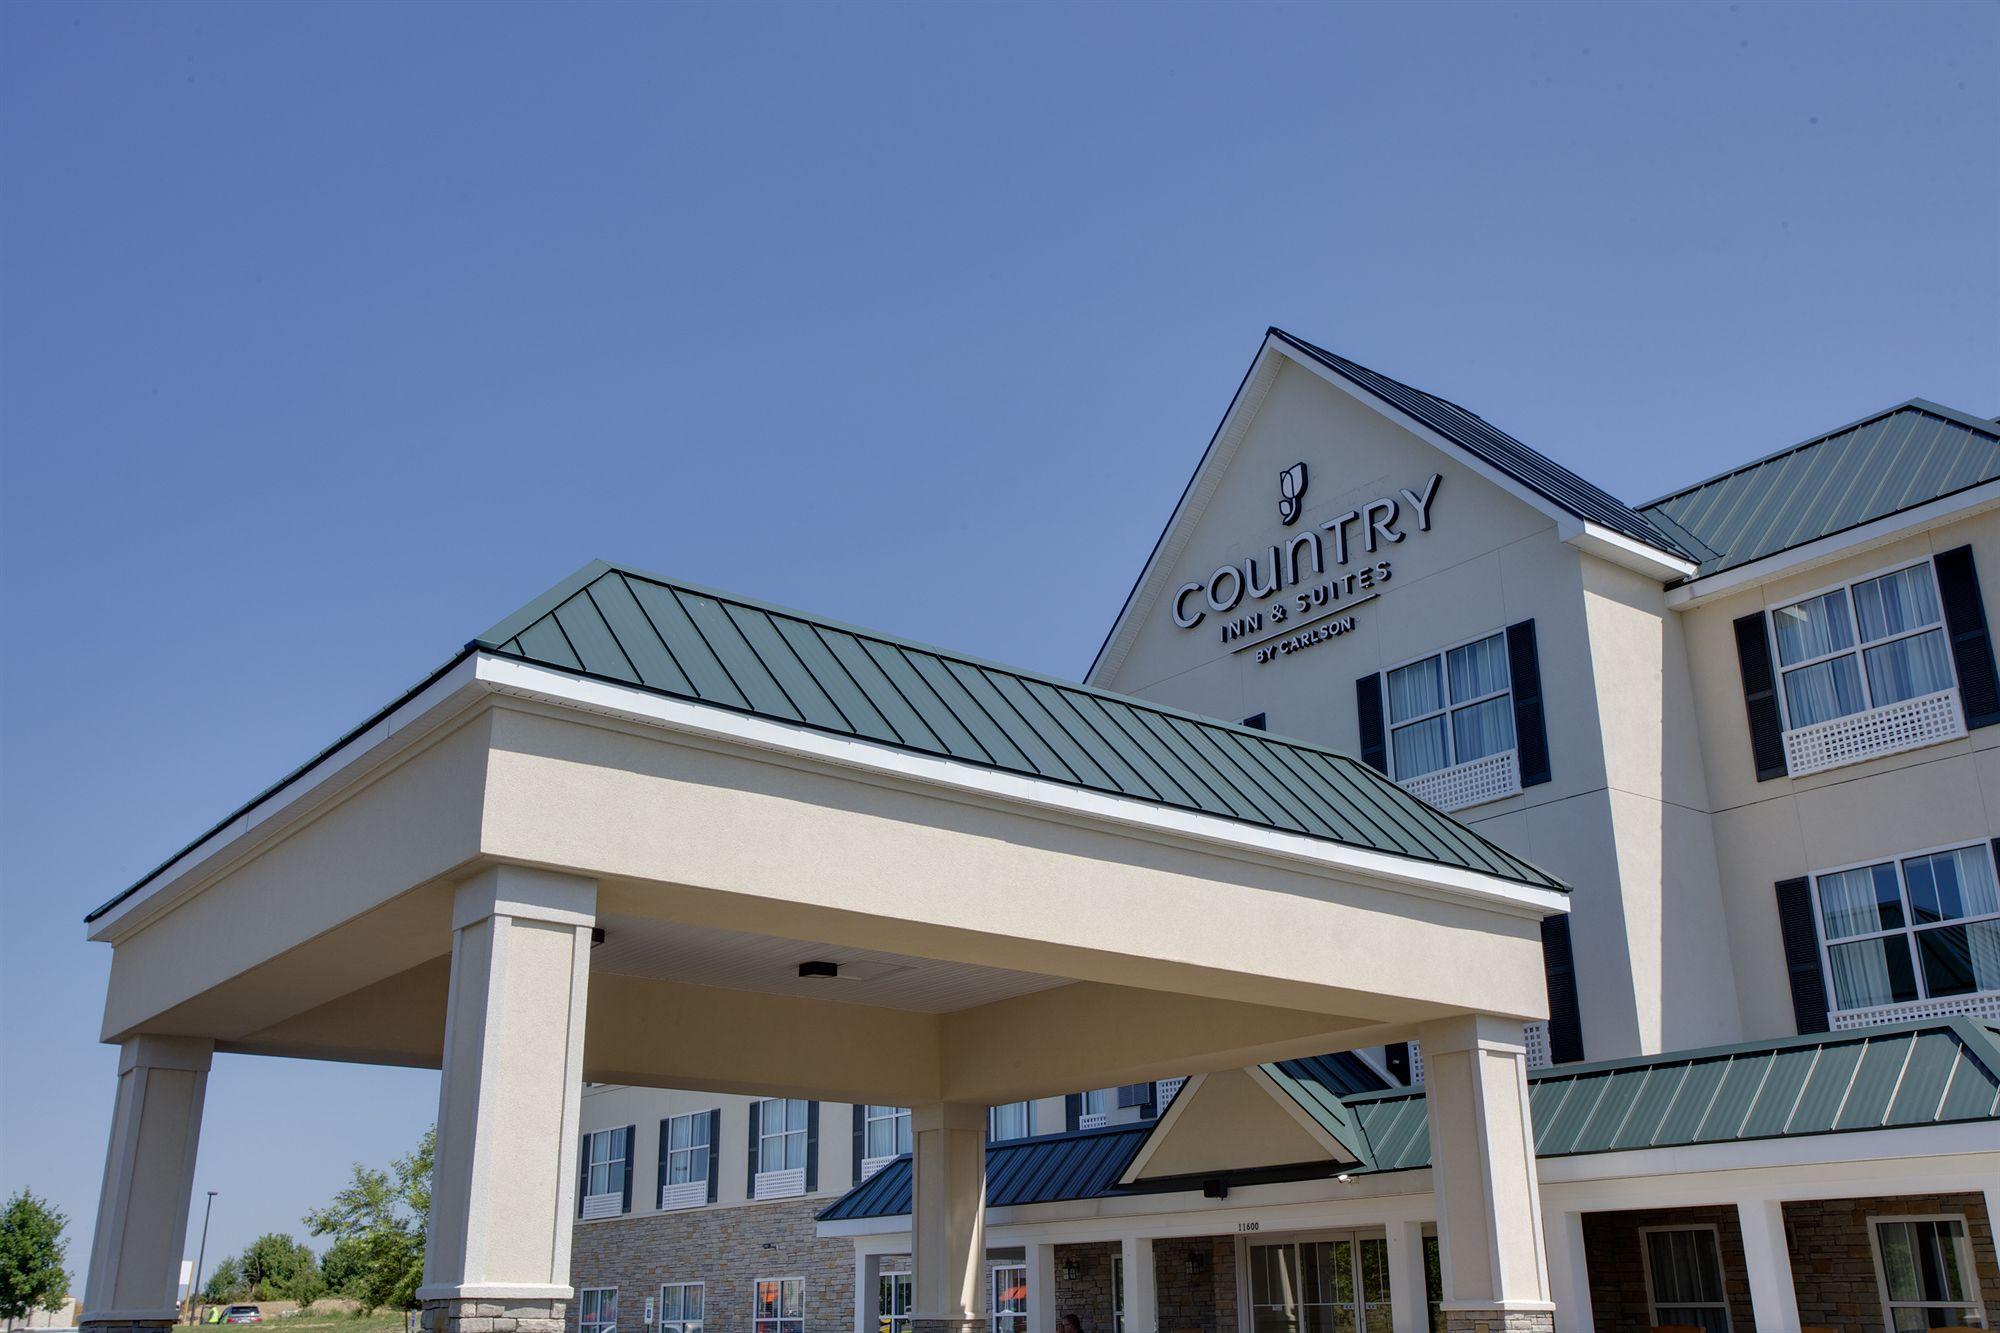 Breakfast Room at Country Inn & Suites Ashland VA Hotel